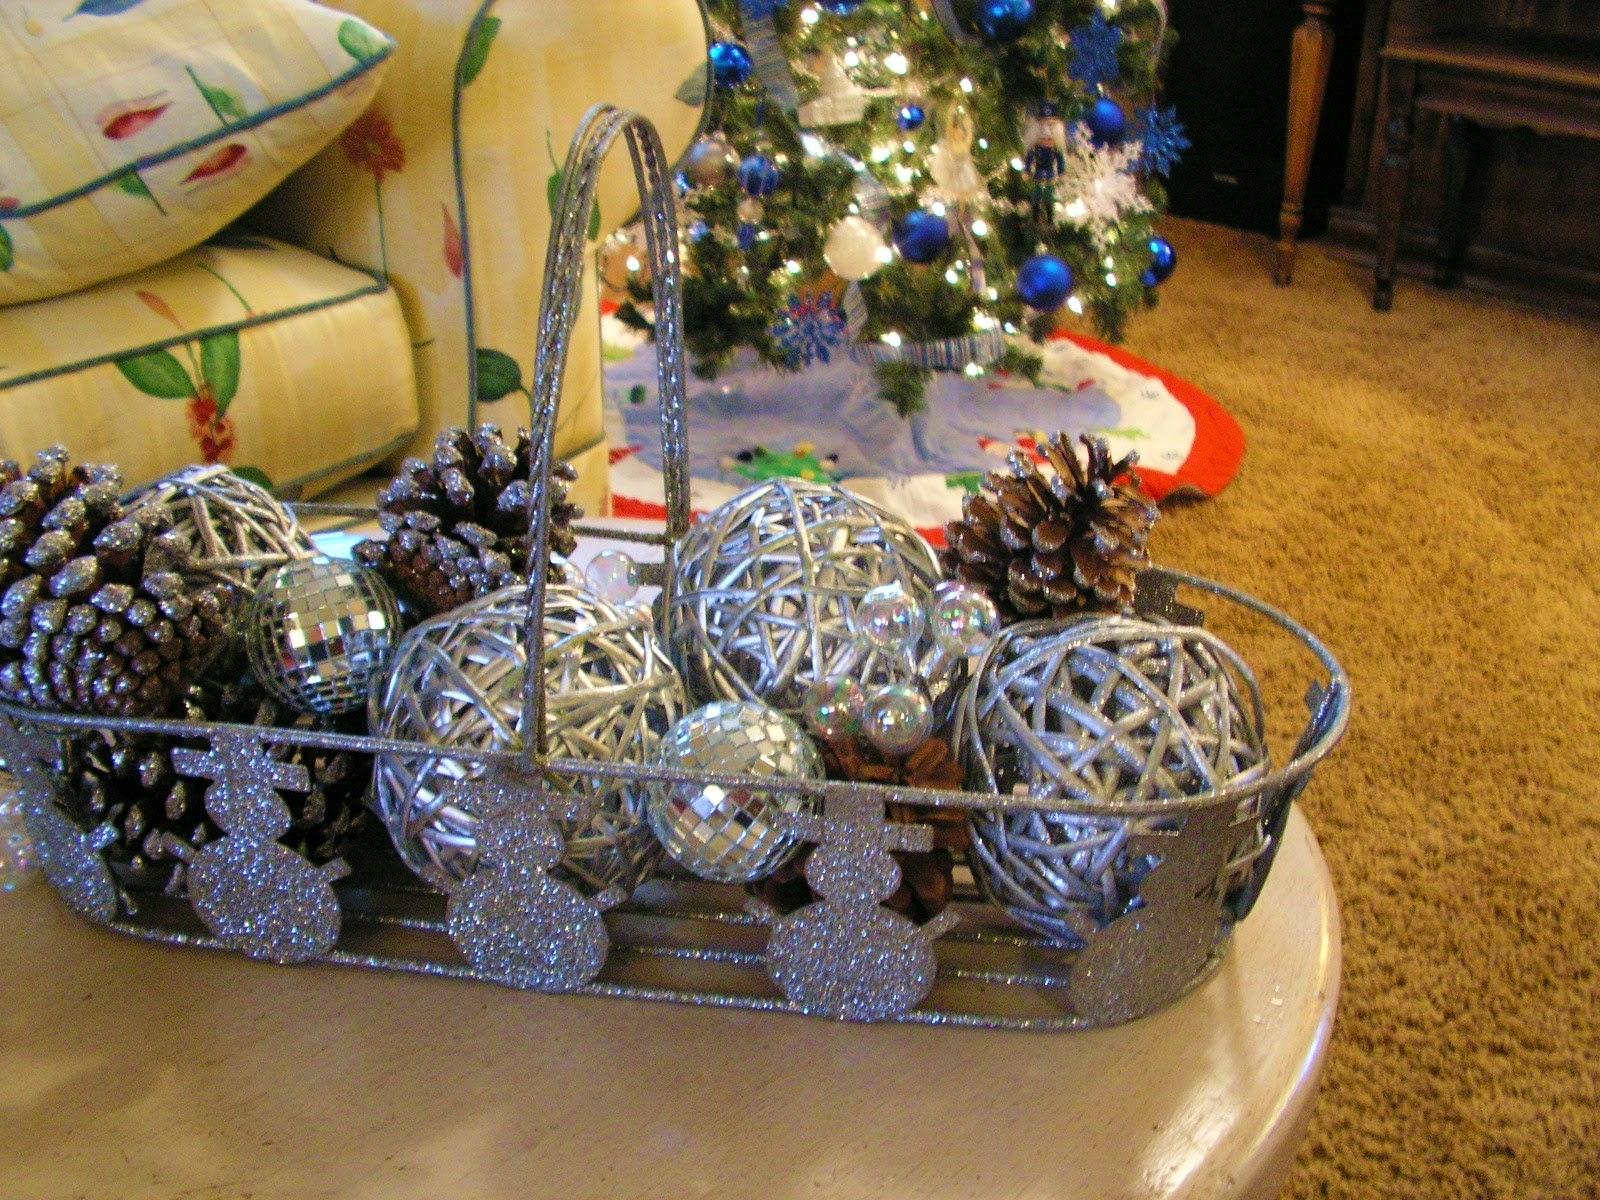 Elegant Christmas Decorations & Best Homes Garden: Elegant Christmas Decorations